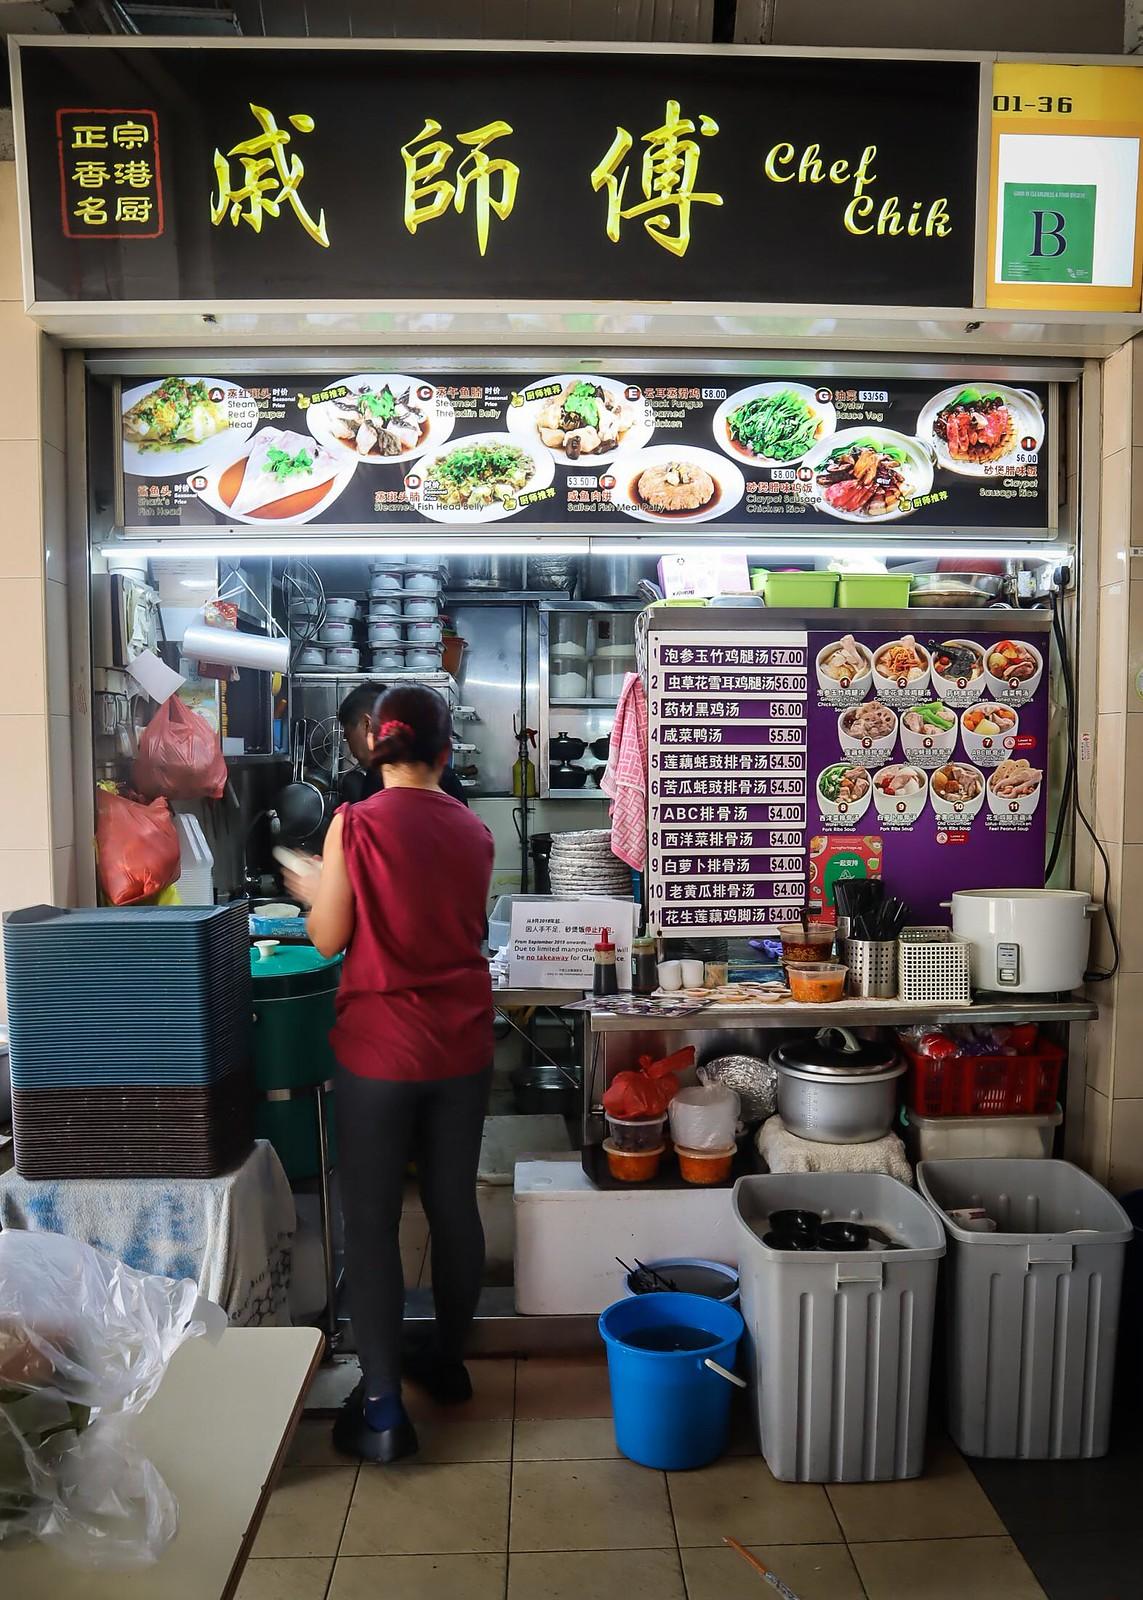 chef chik storefront portrait 2